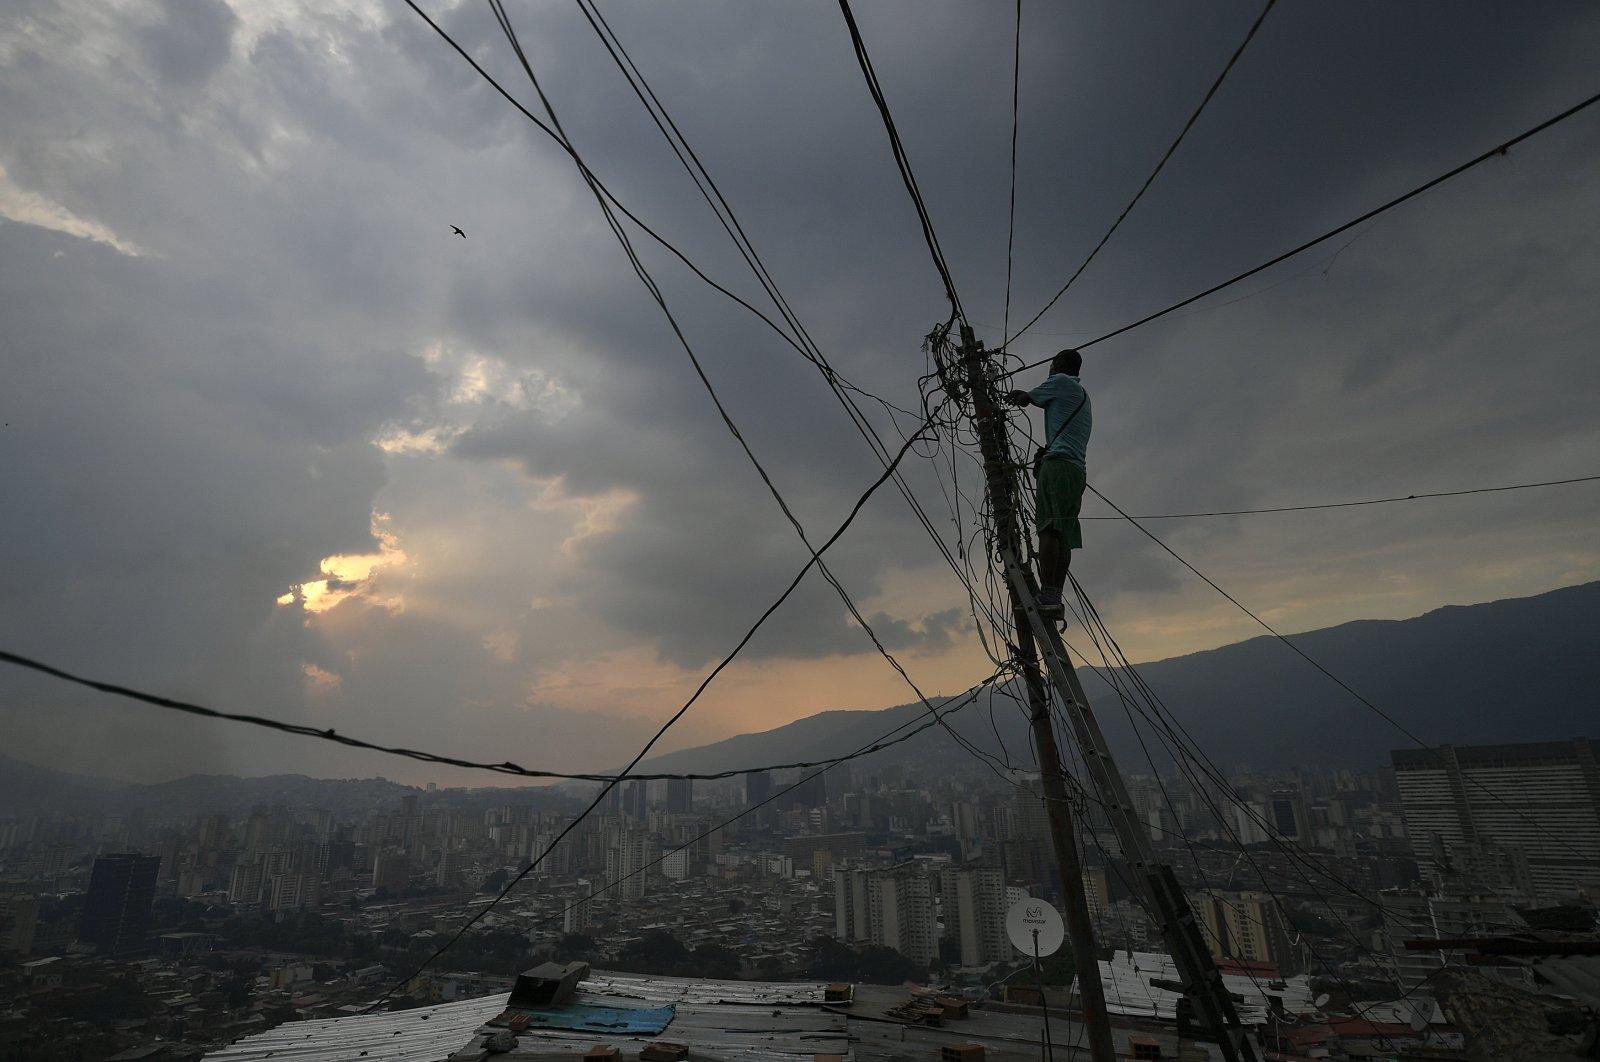 A man fixes power lines in the San Agustin neighborhood of Caracas, Venezuela,  May 17, 2020. (AP Photo)